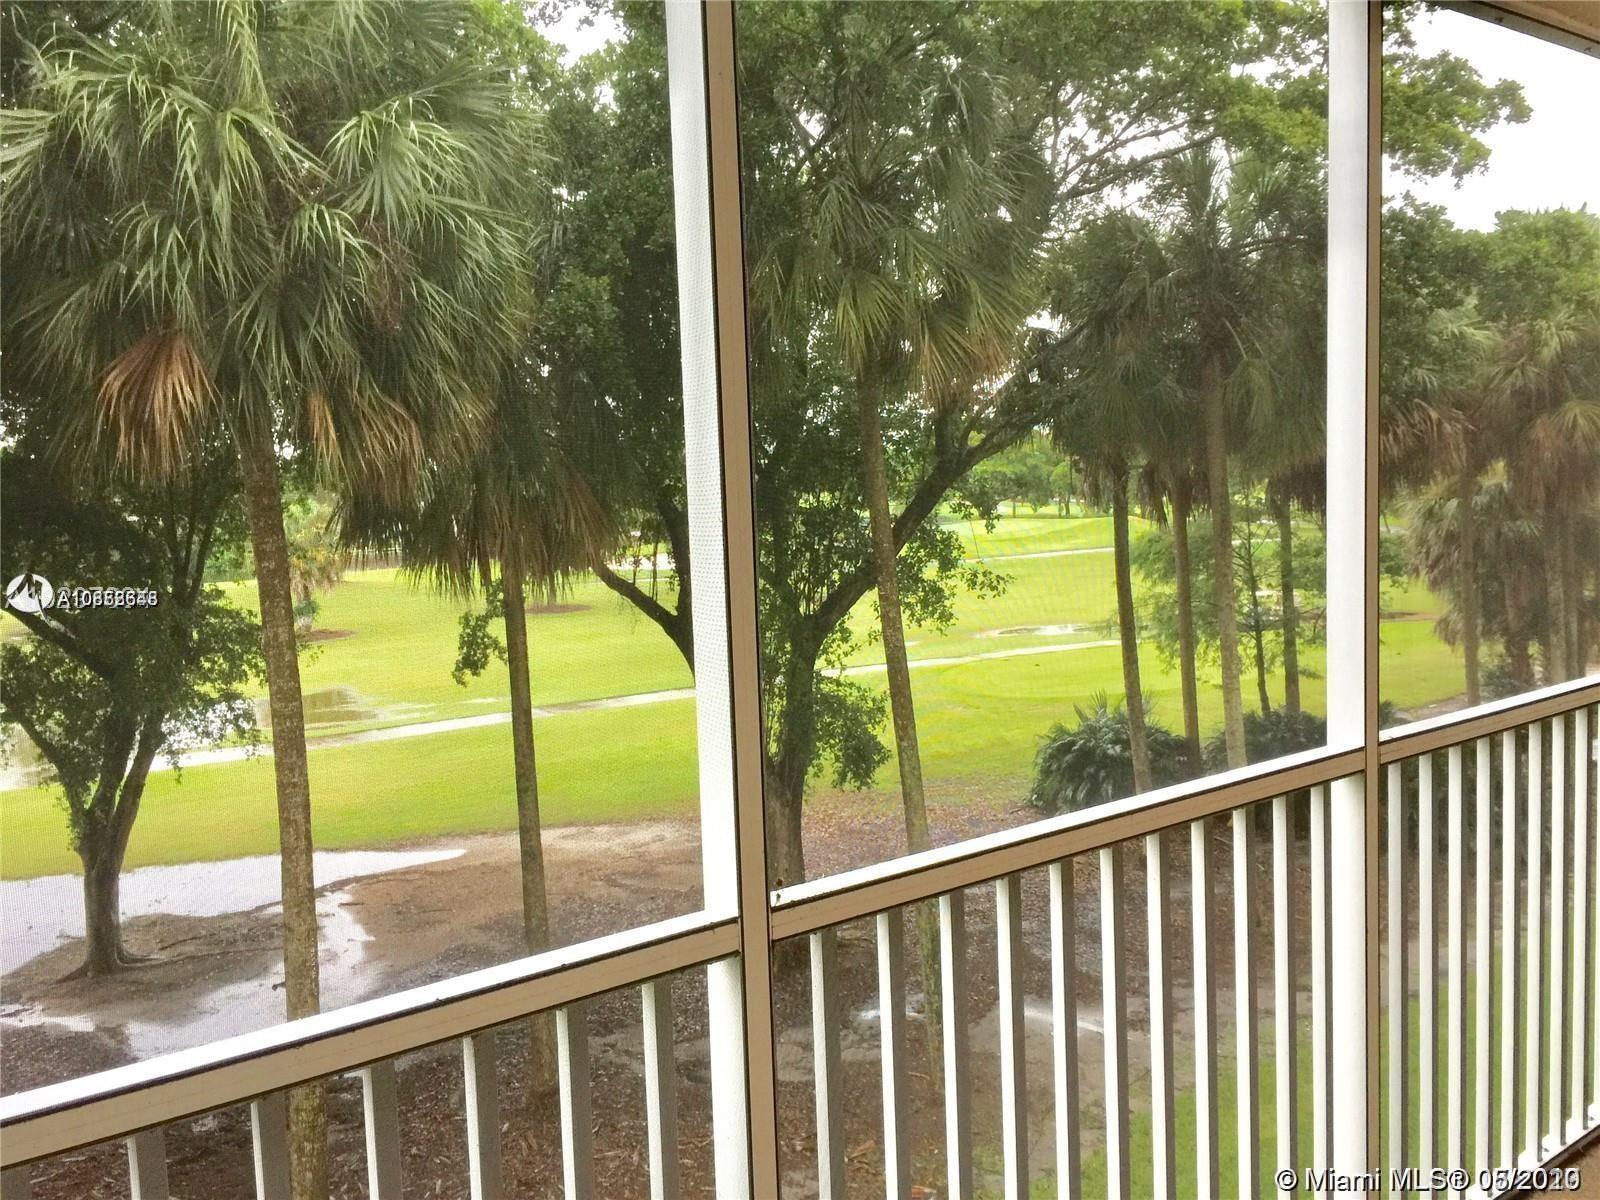 250 Jacaranda Dr # 303, Plantation, Florida 33324, 2 Bedrooms Bedrooms, ,2 BathroomsBathrooms,Residential Lease,For Rent,250 Jacaranda Dr # 303,A10853648